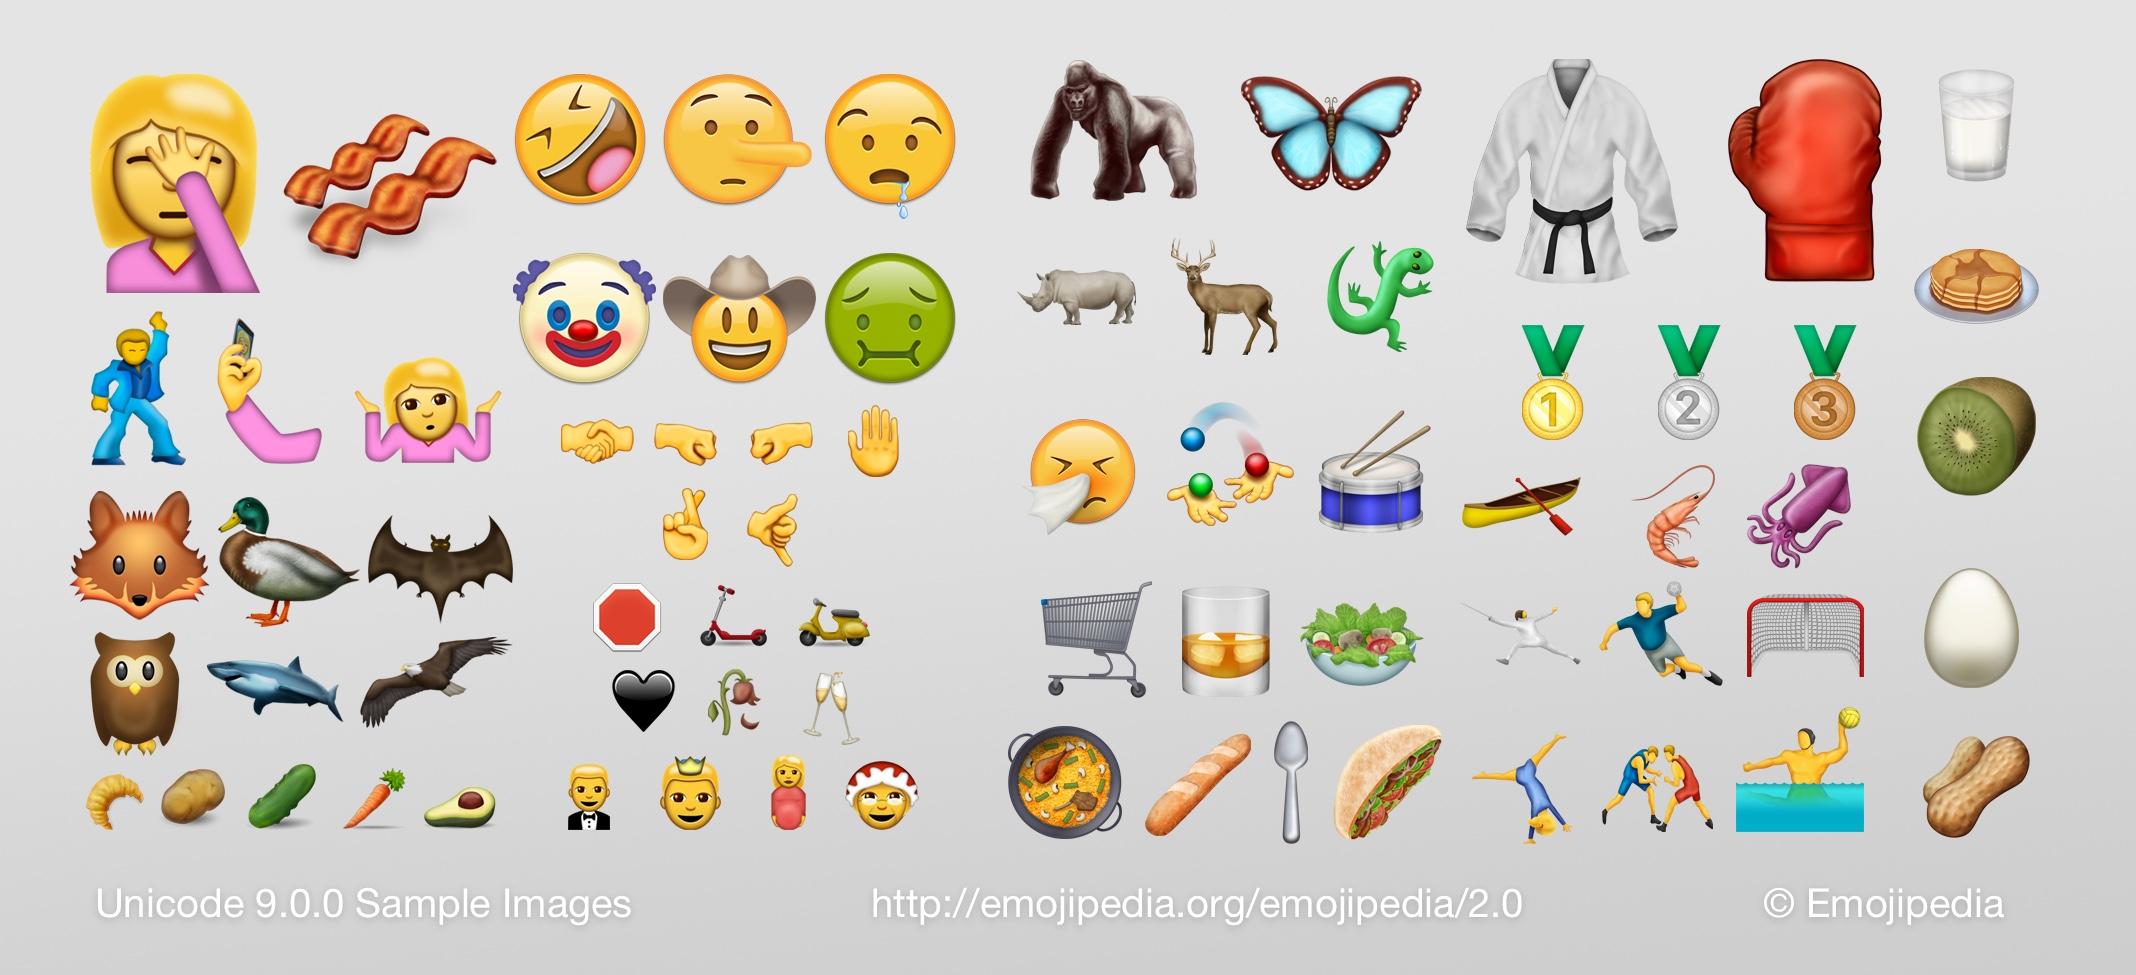 unicode-9-emojis-emojipedia (1)